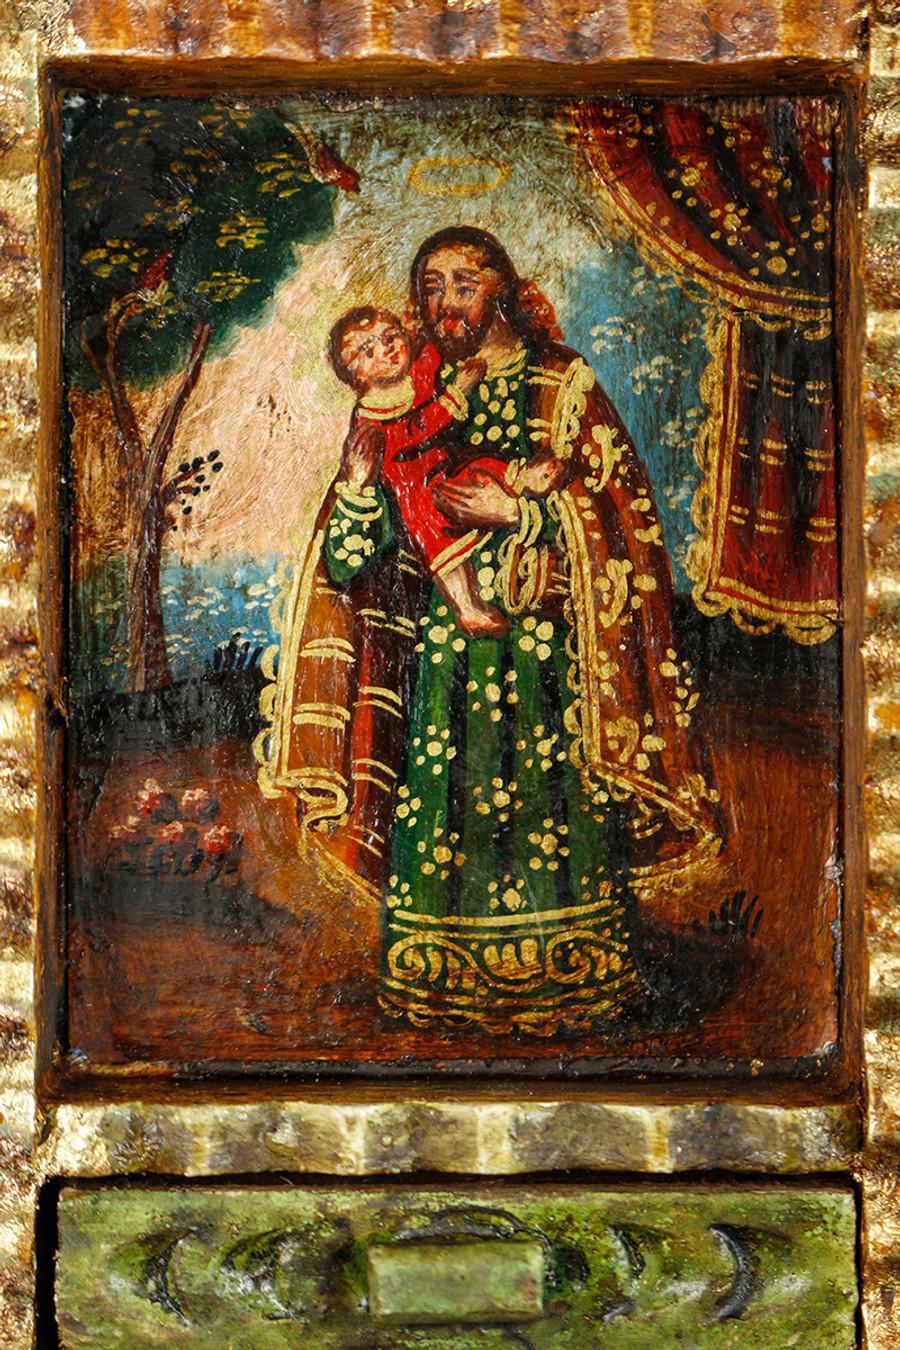 Saint Joseph and Child Colonial Peru Art Handmade Retablo Handcarved Altarpiece (71-100-04428)